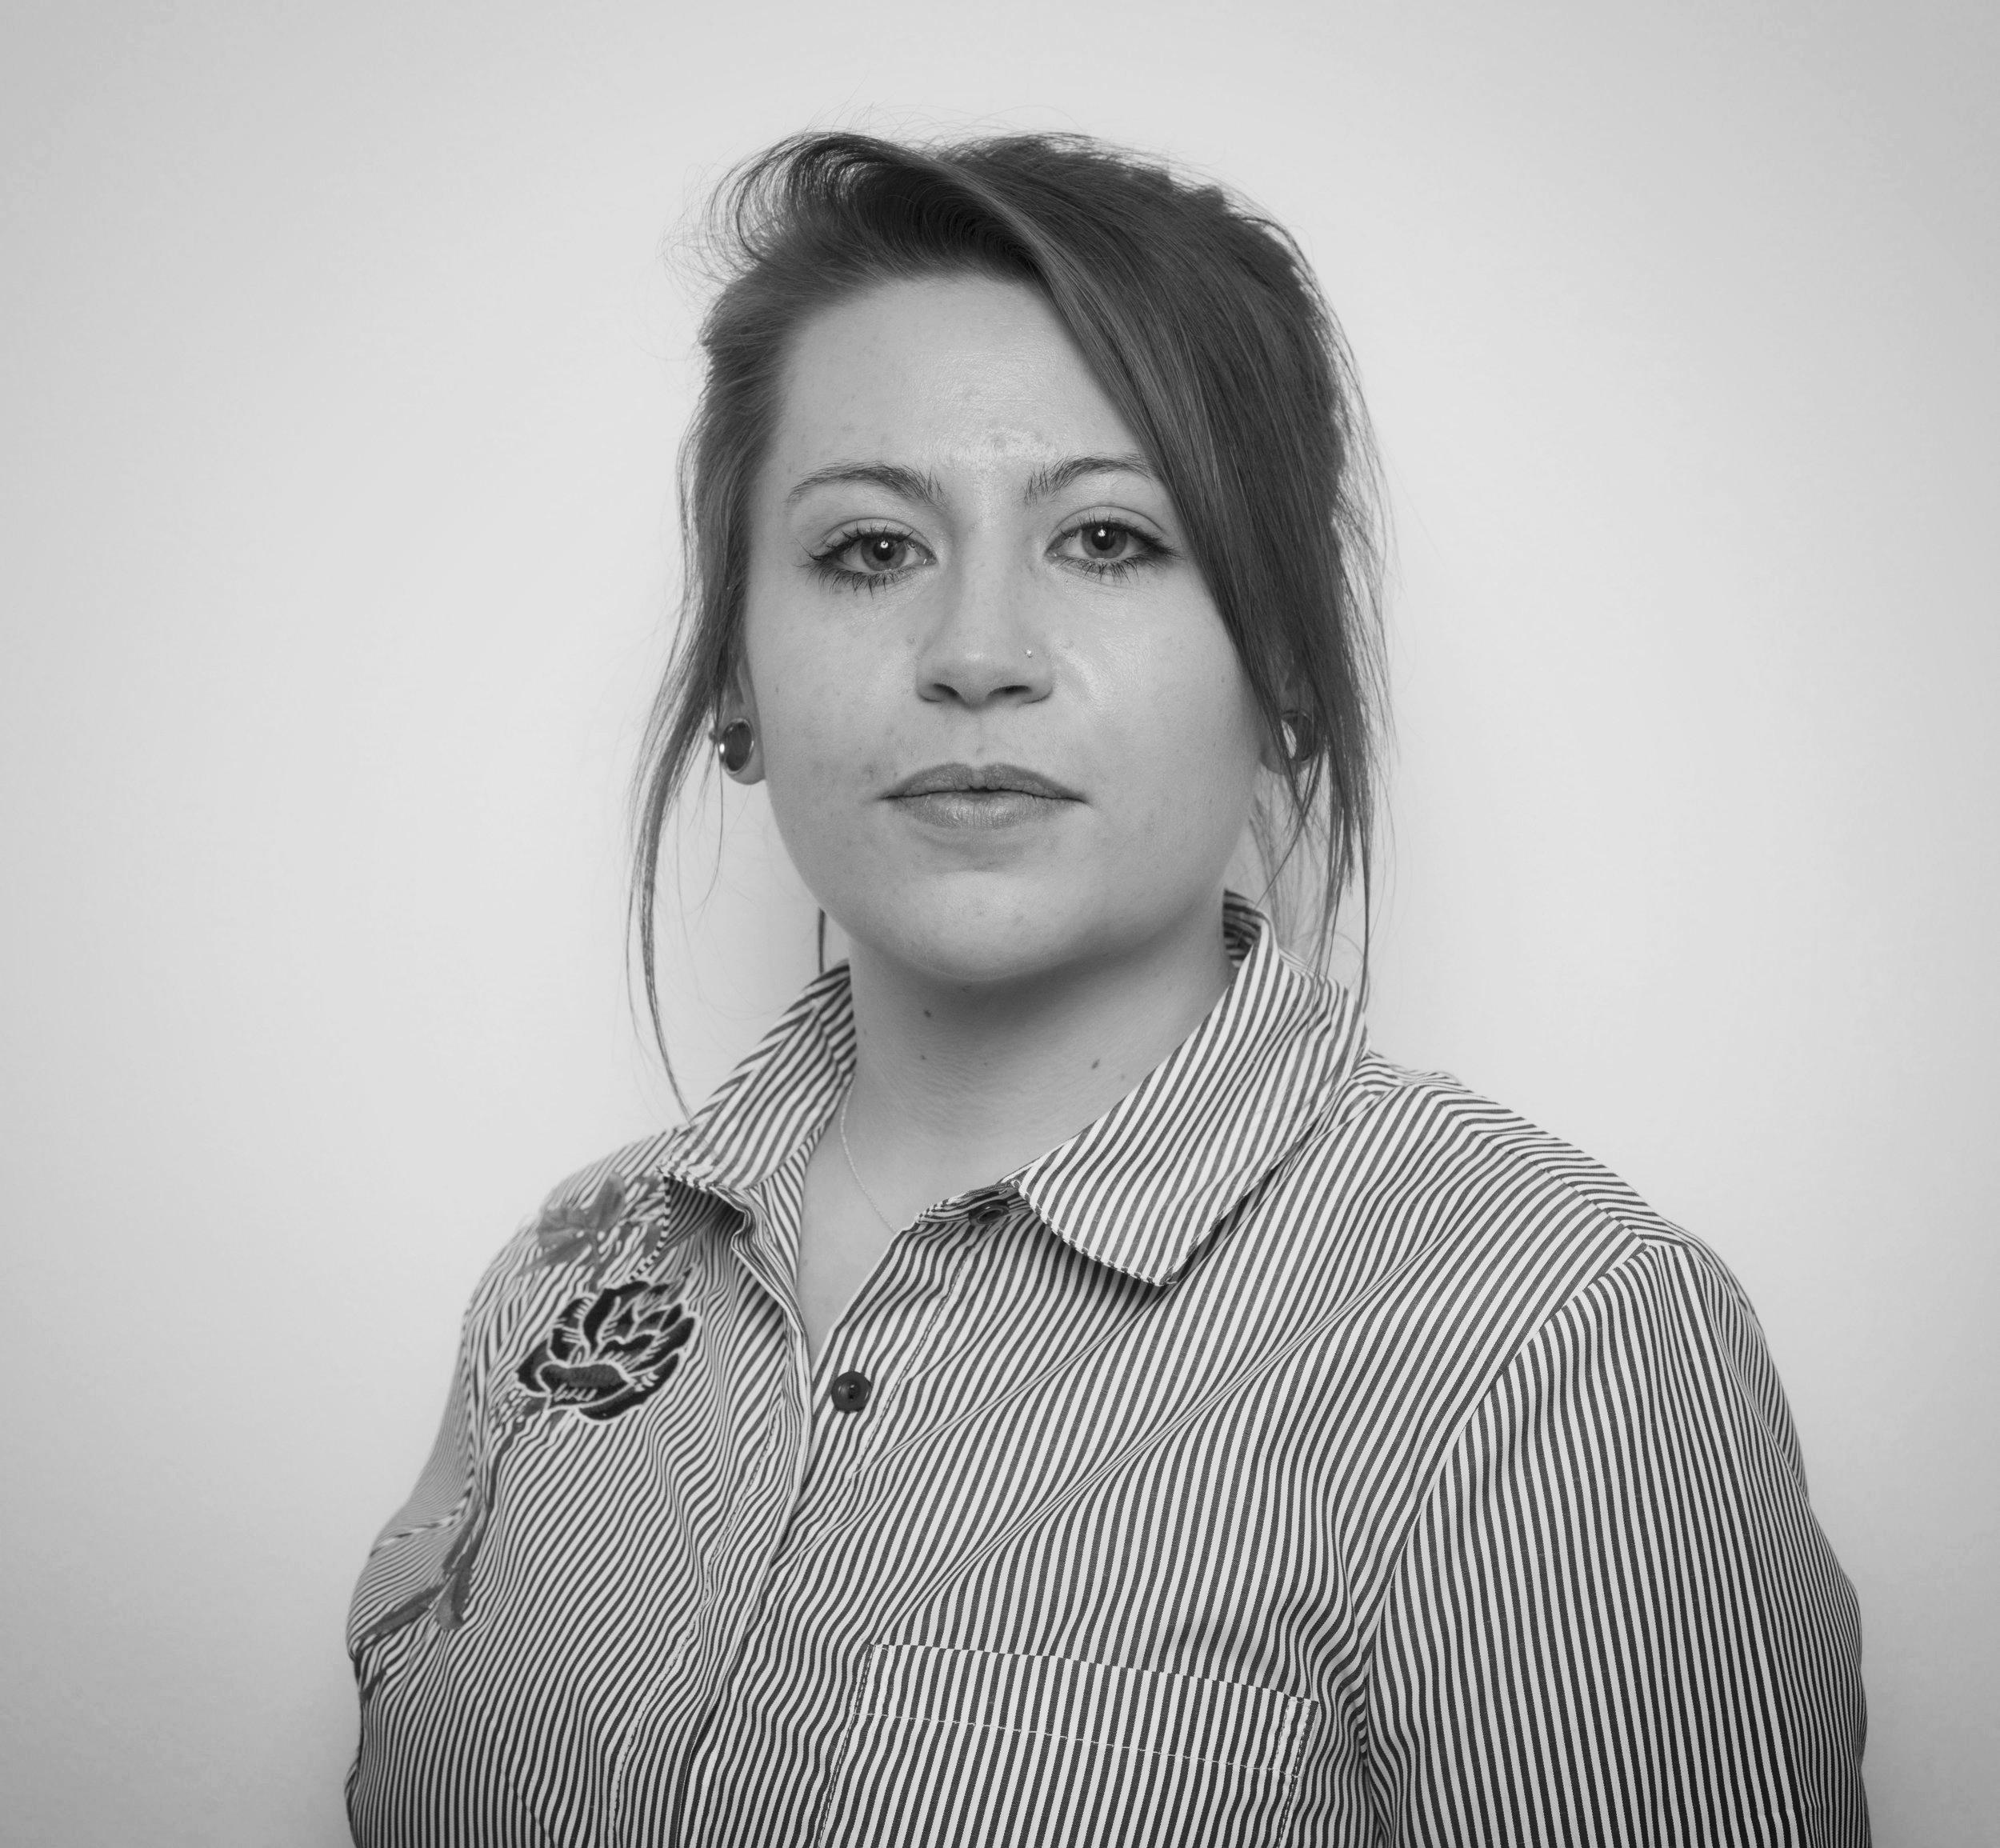 <b>Amie Smith</b><br>Account Executive, Tech